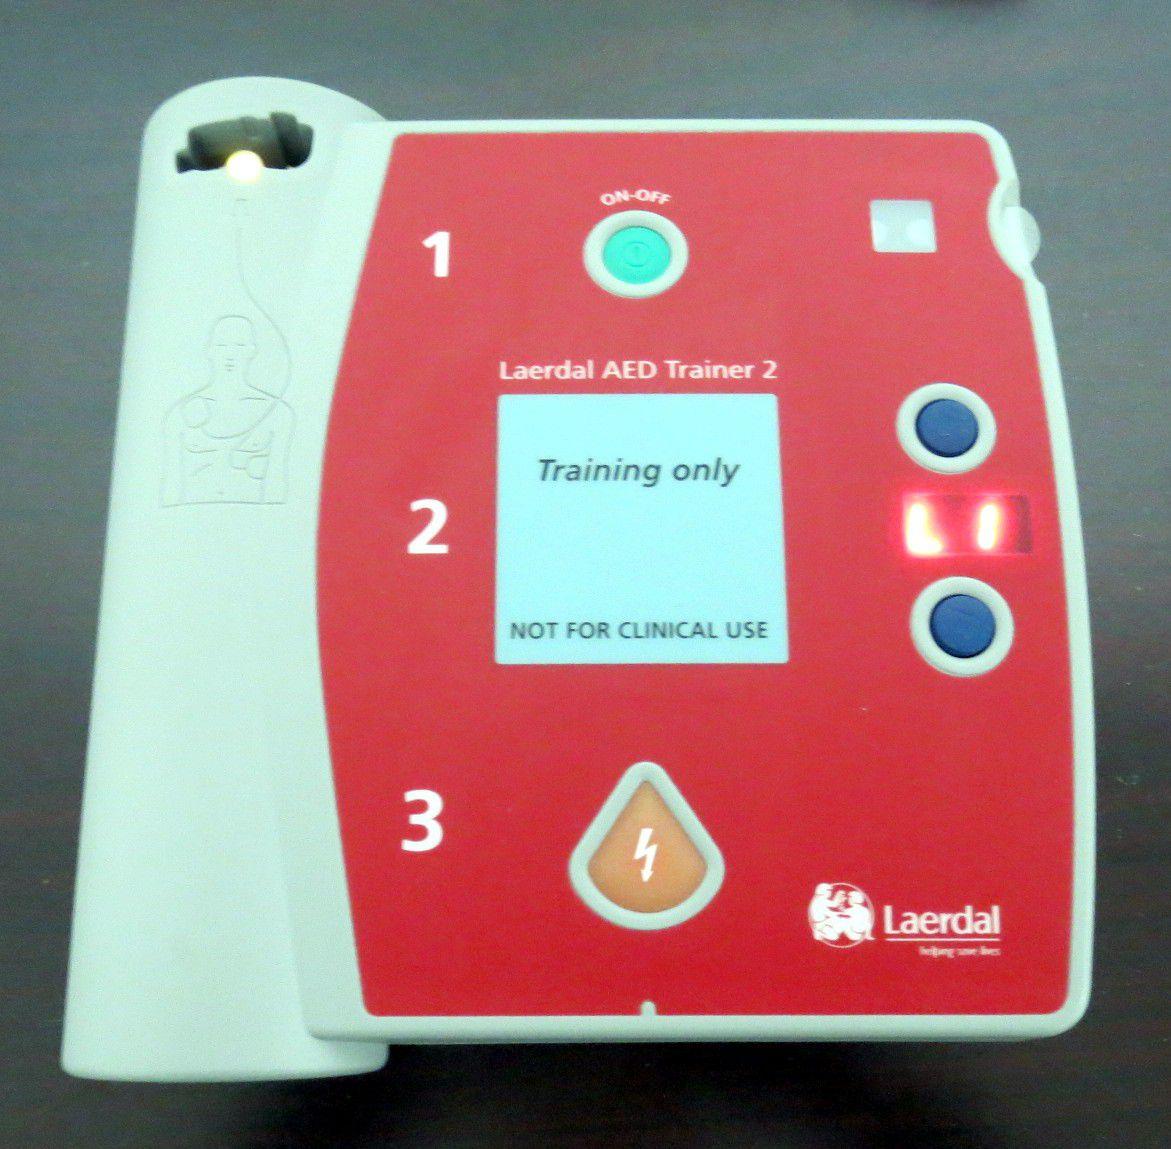 Laerdal Aed Trainer 2 Defibrillator - Model Information